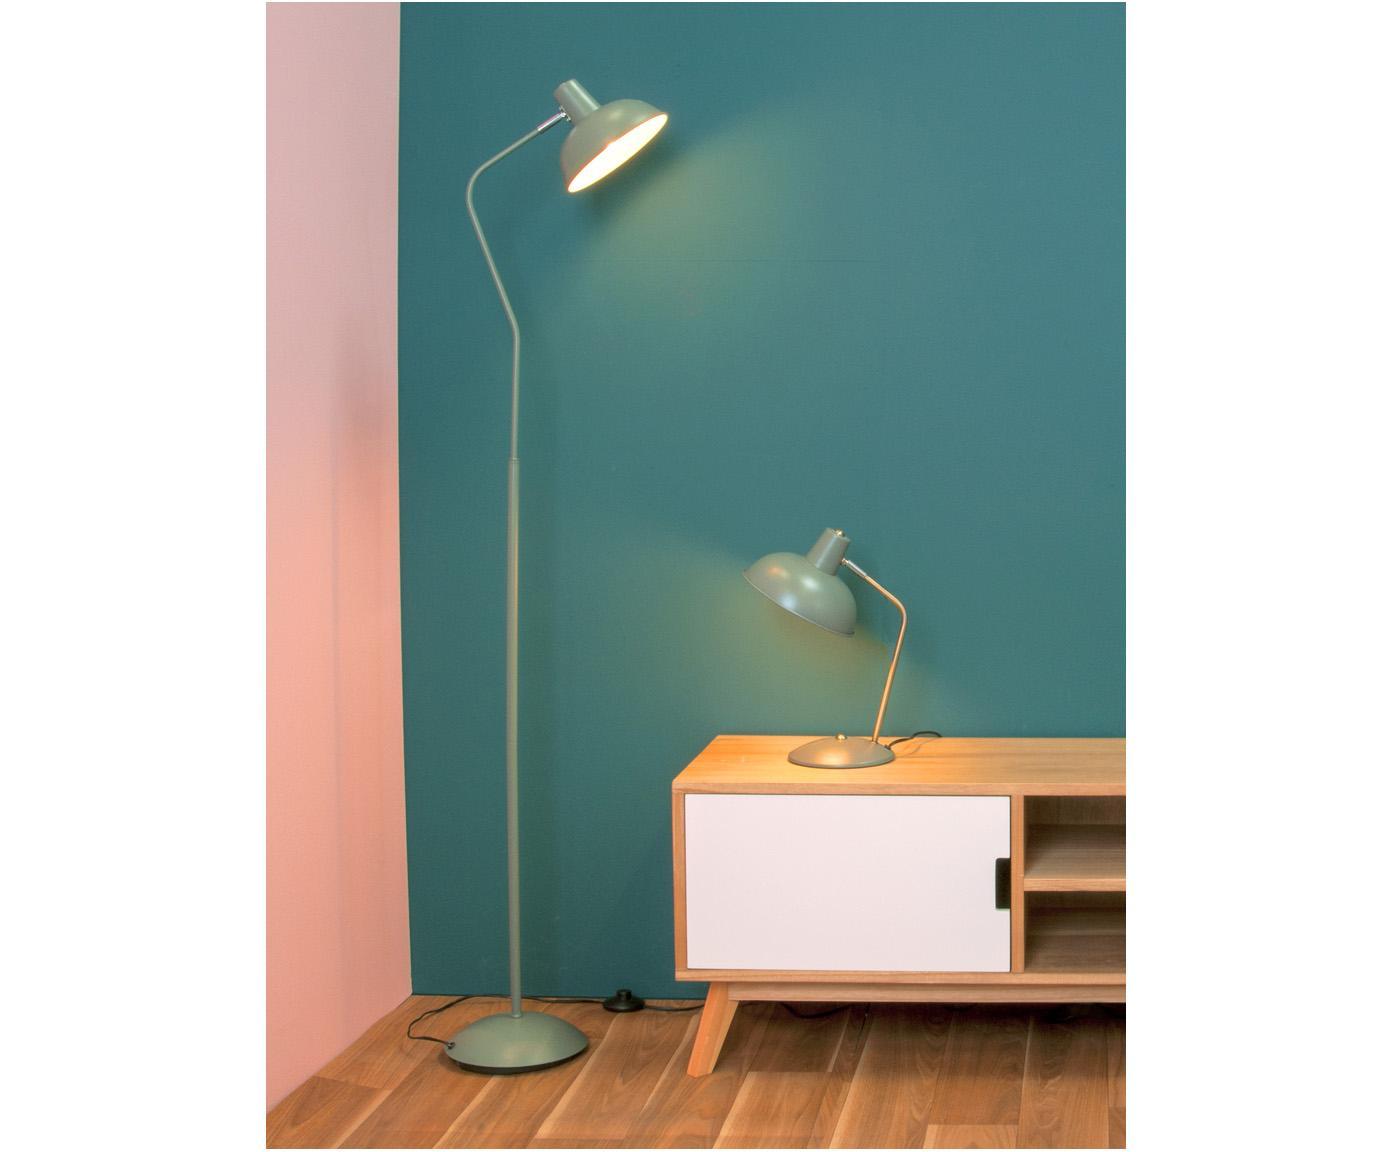 Lampada da tavolo retrò Hood, Lampada: verde, ottonato Paralume interno: bianco, Larg. 20 x Alt. 38 cm